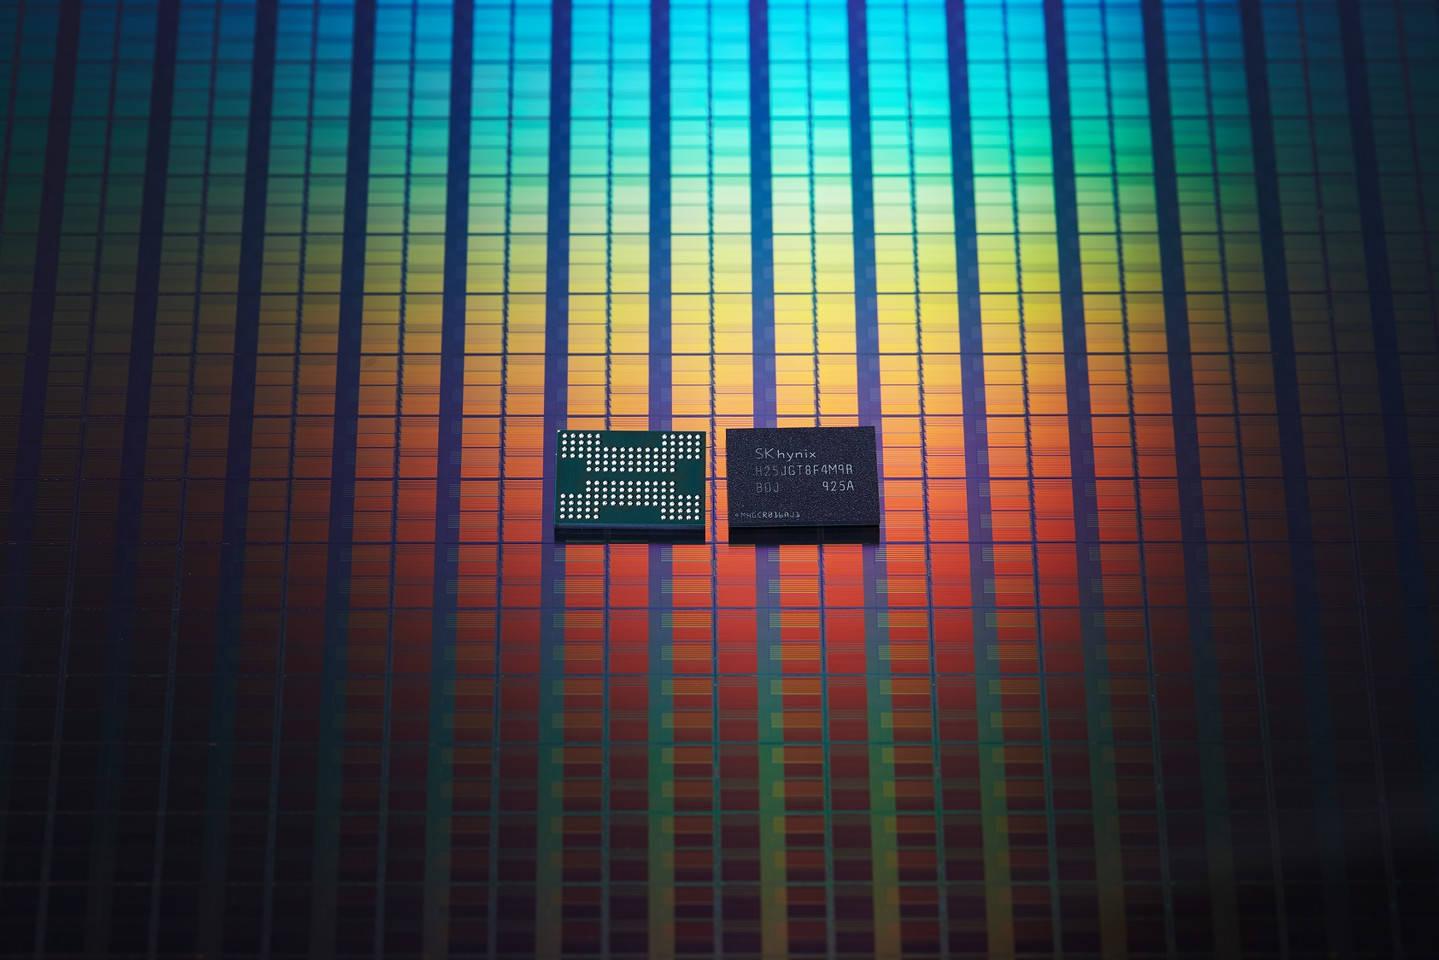 SK Hynix 4D NAND 128 layer